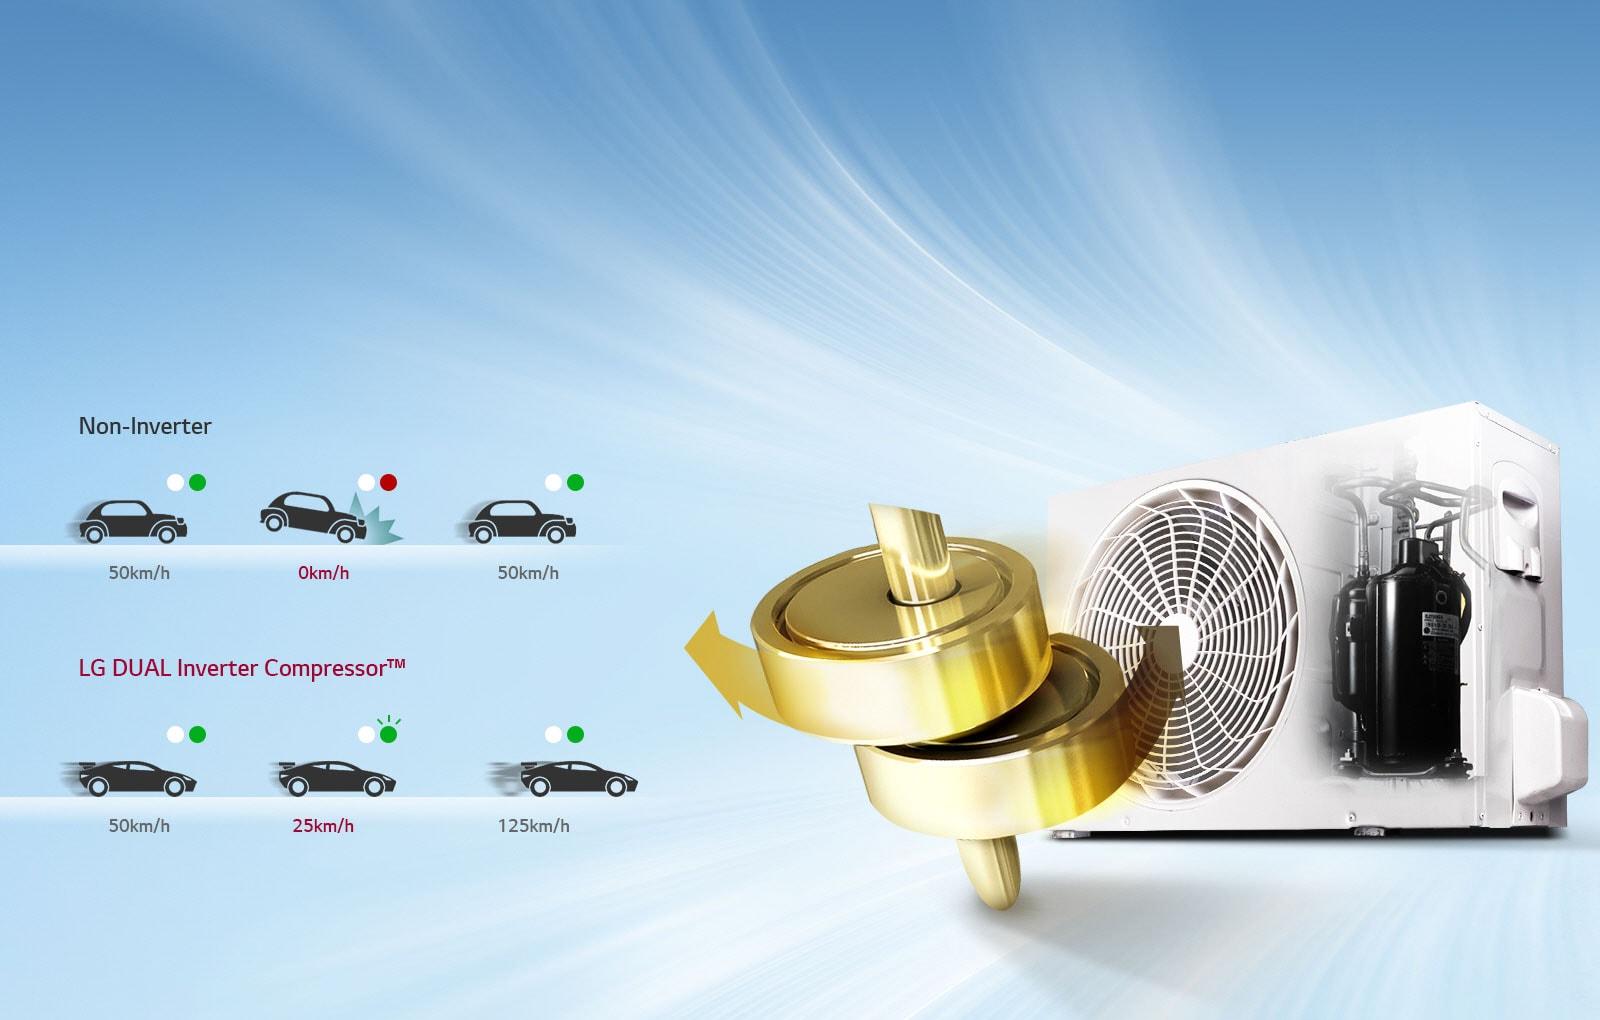 DUAL Inverter Compressor™